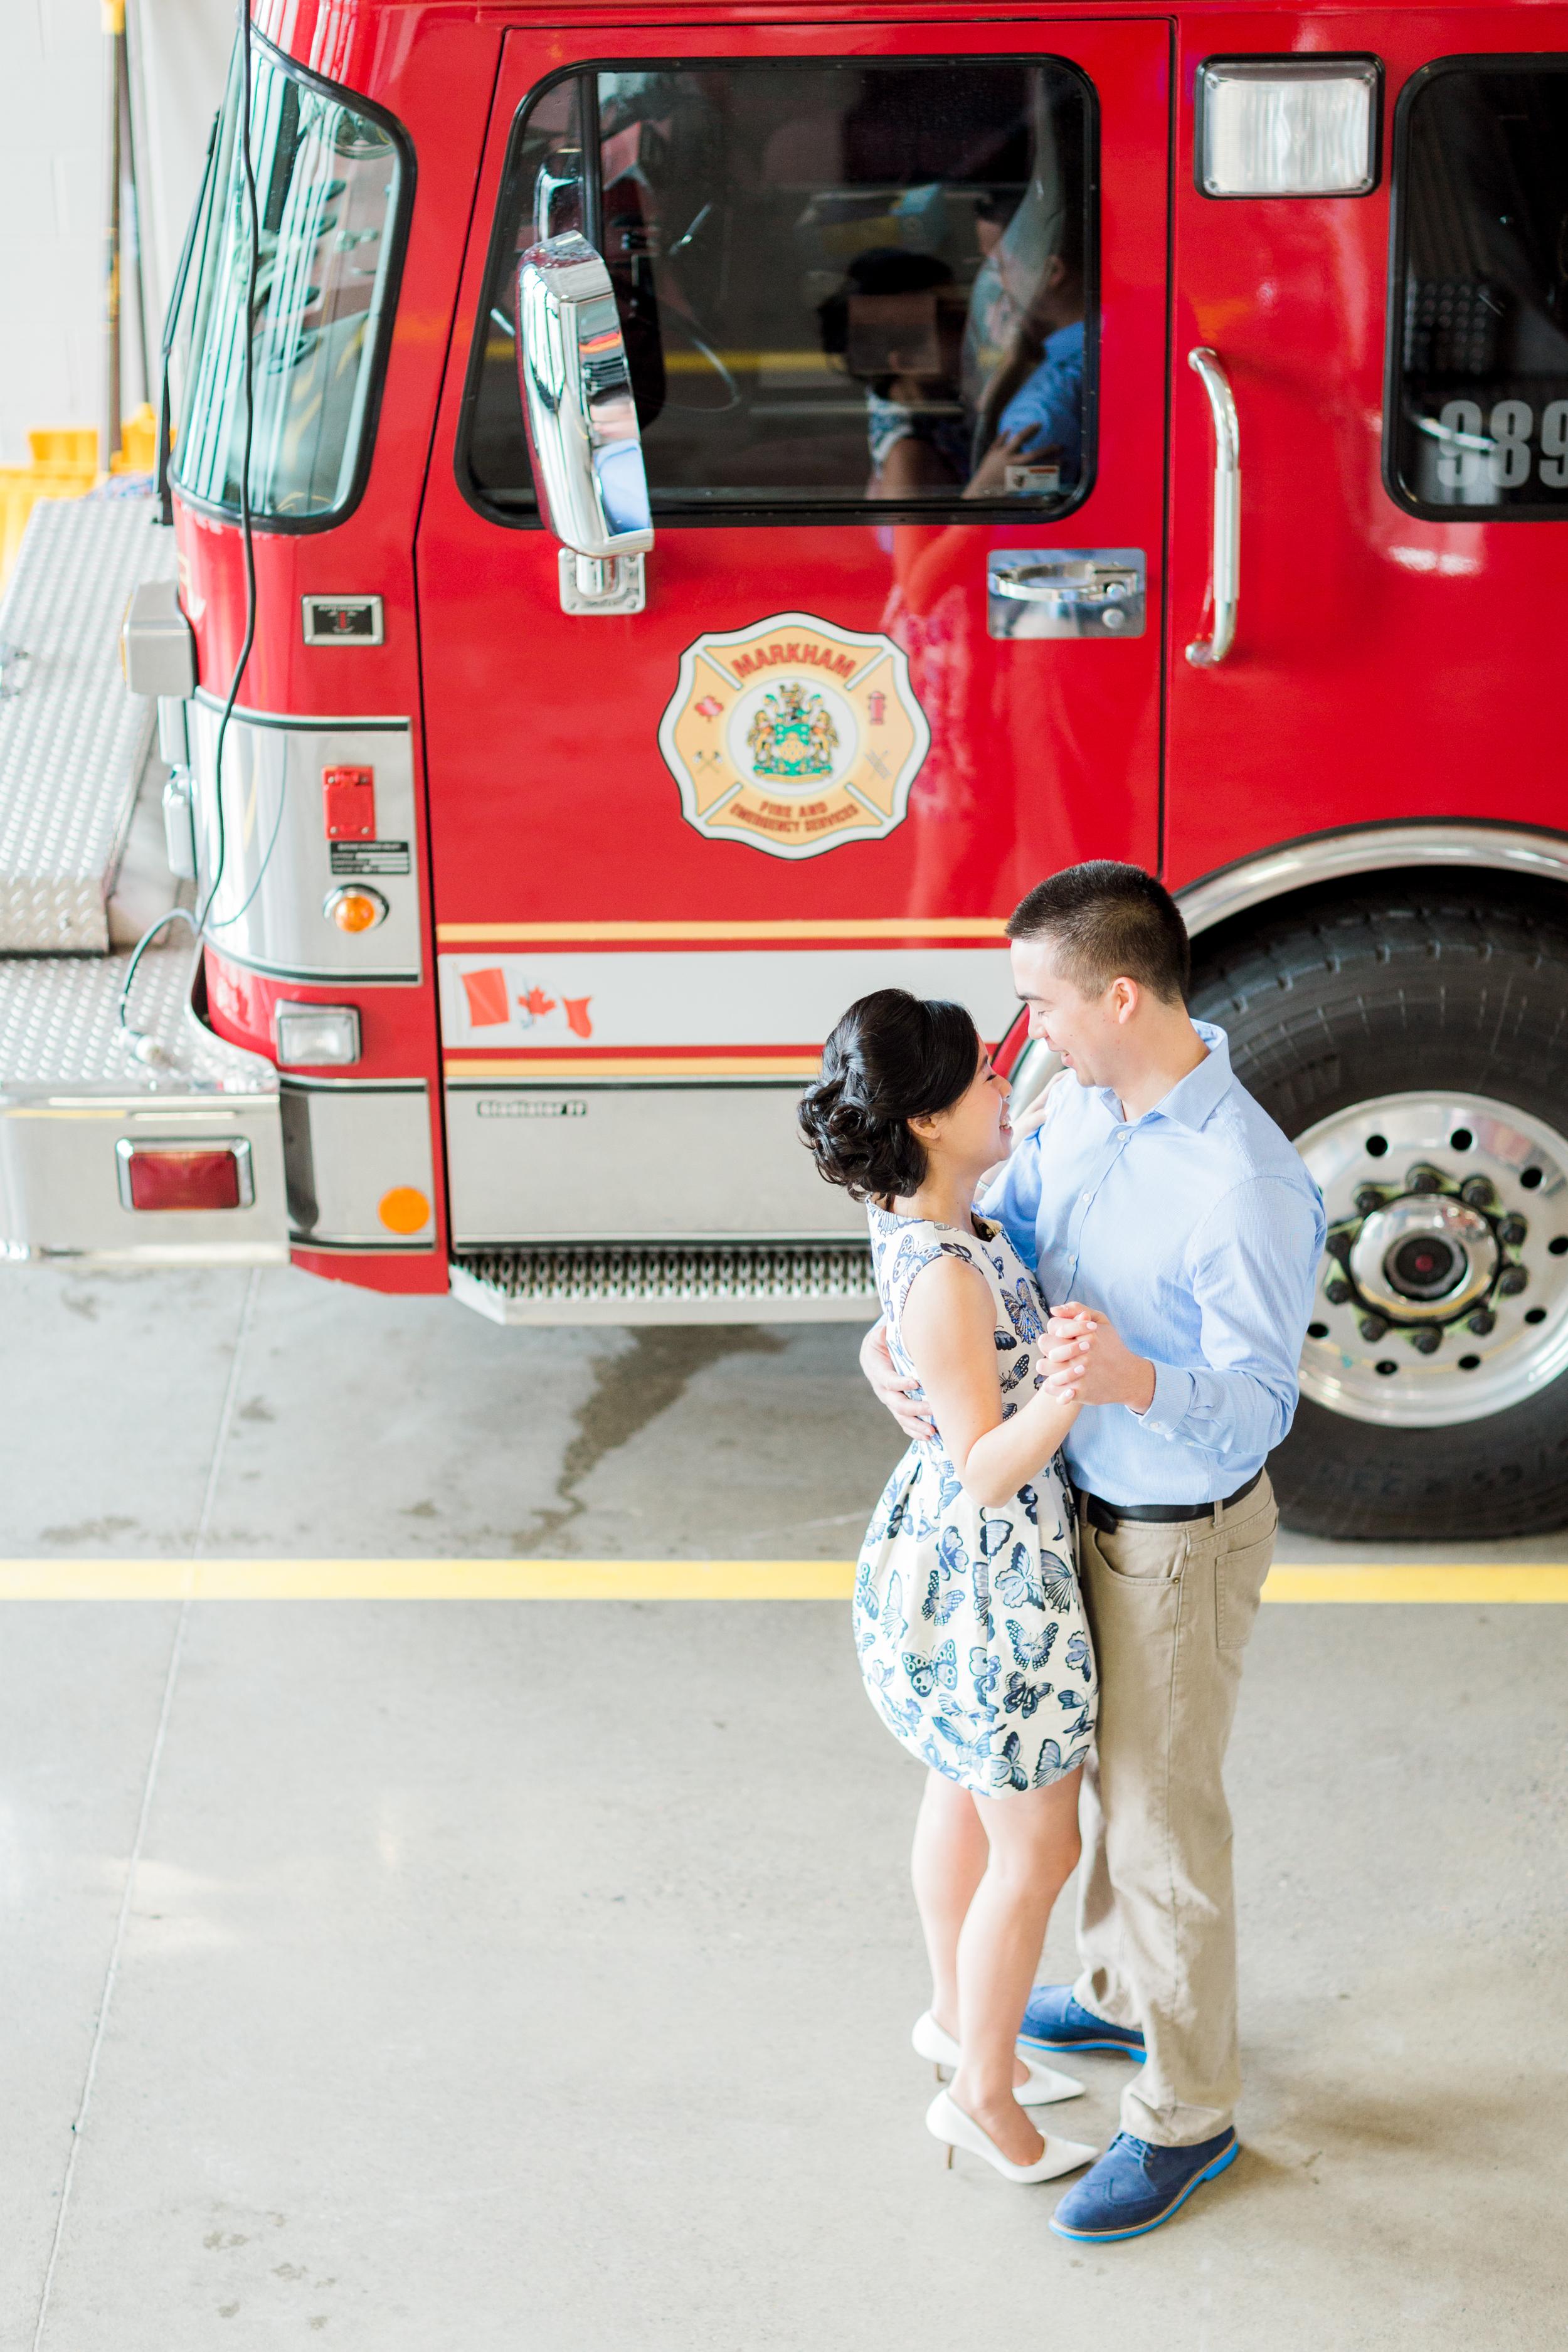 Cari Zhu Photography - Markham Fire Station Engagement Session-4511.jpg